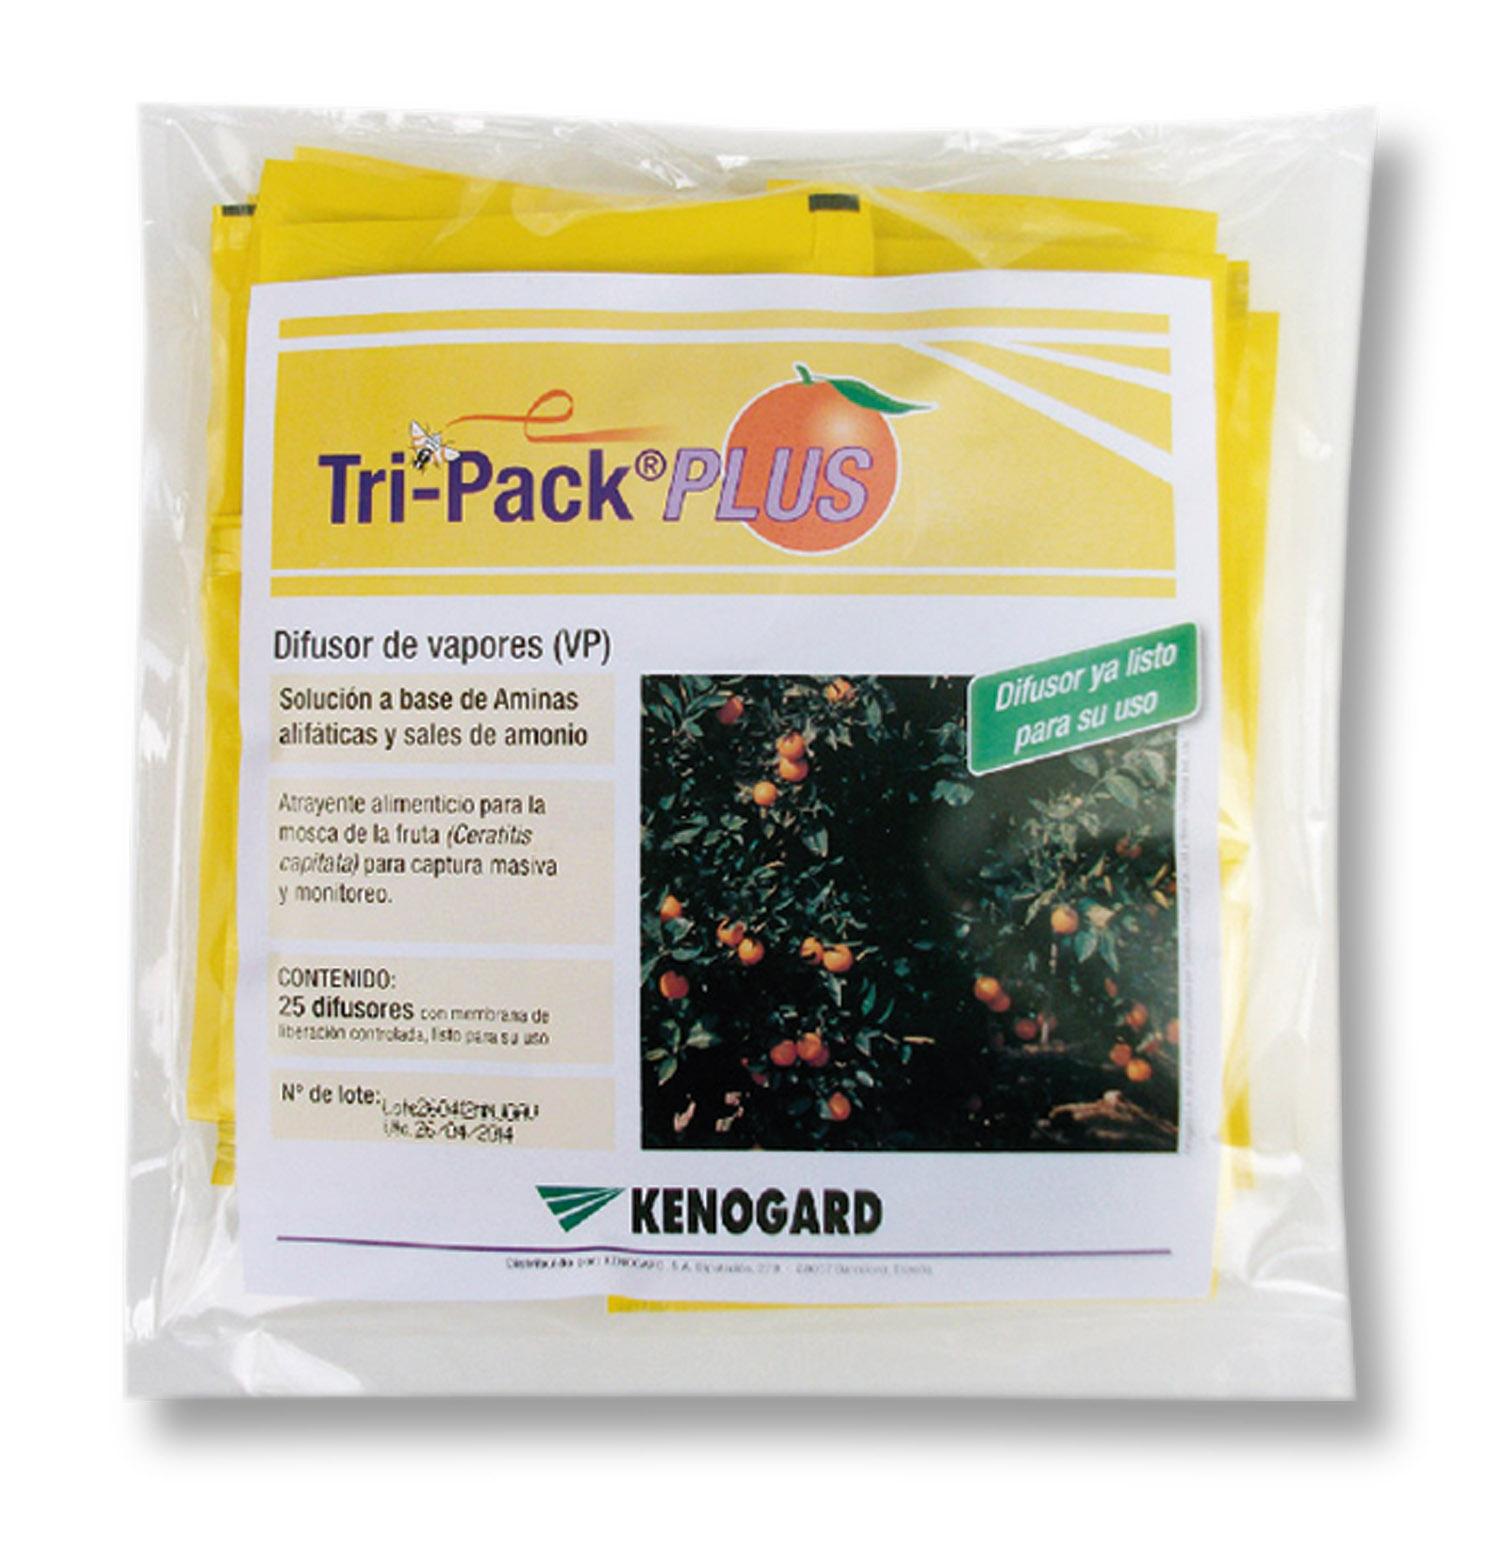 TriPack Plus